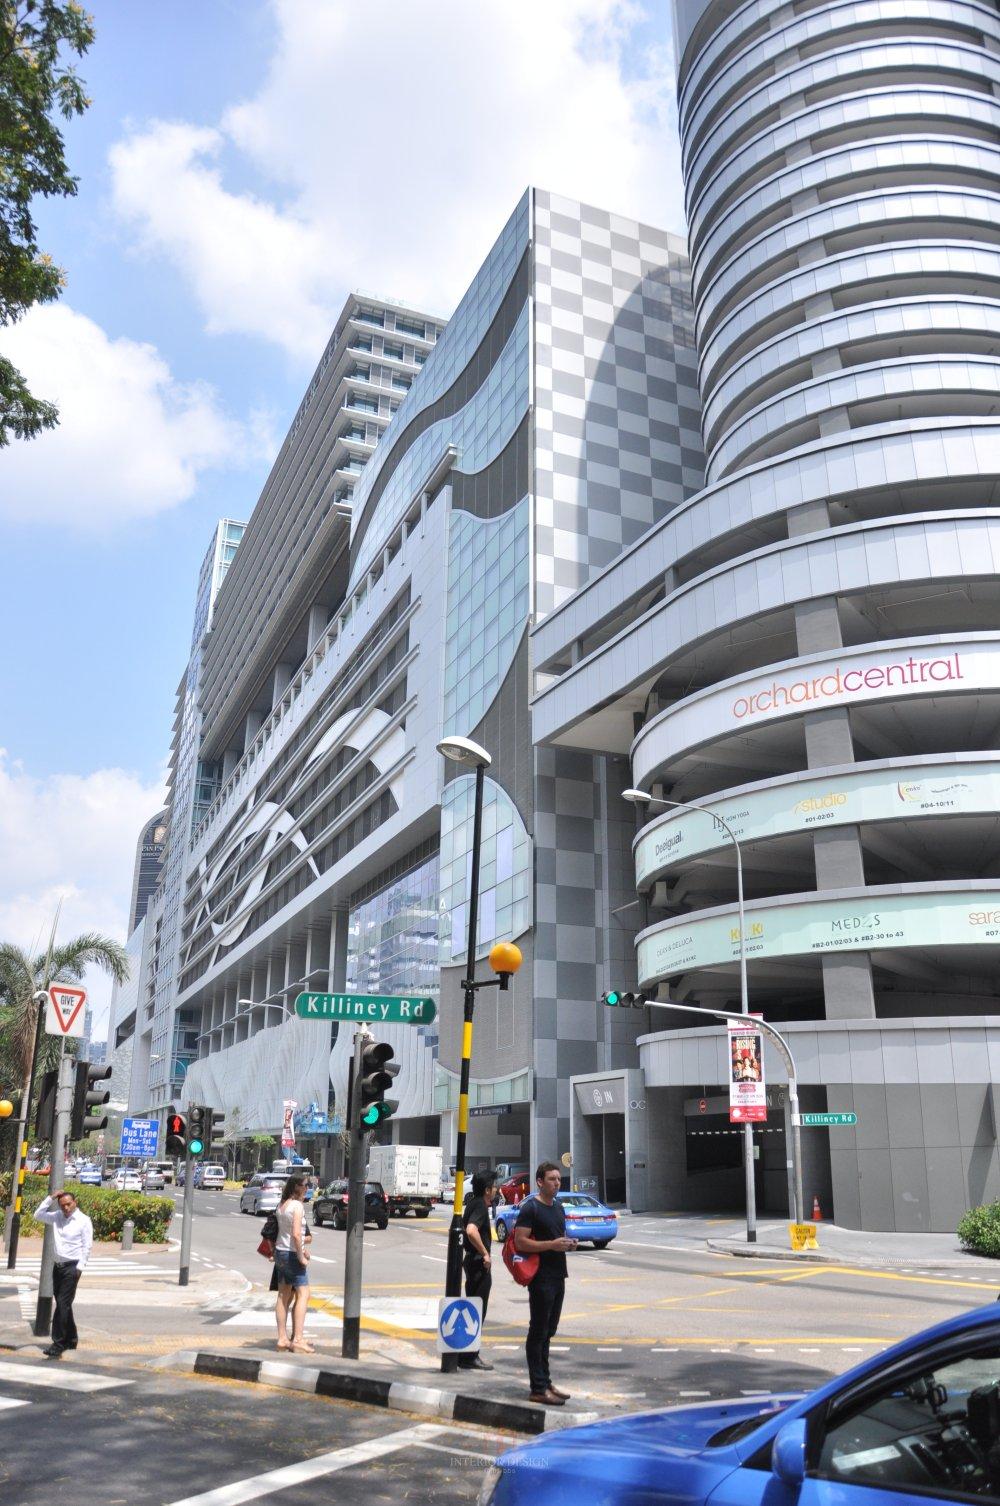 新加坡Orchard Central商业自拍_DSC_0349 (3).JPG